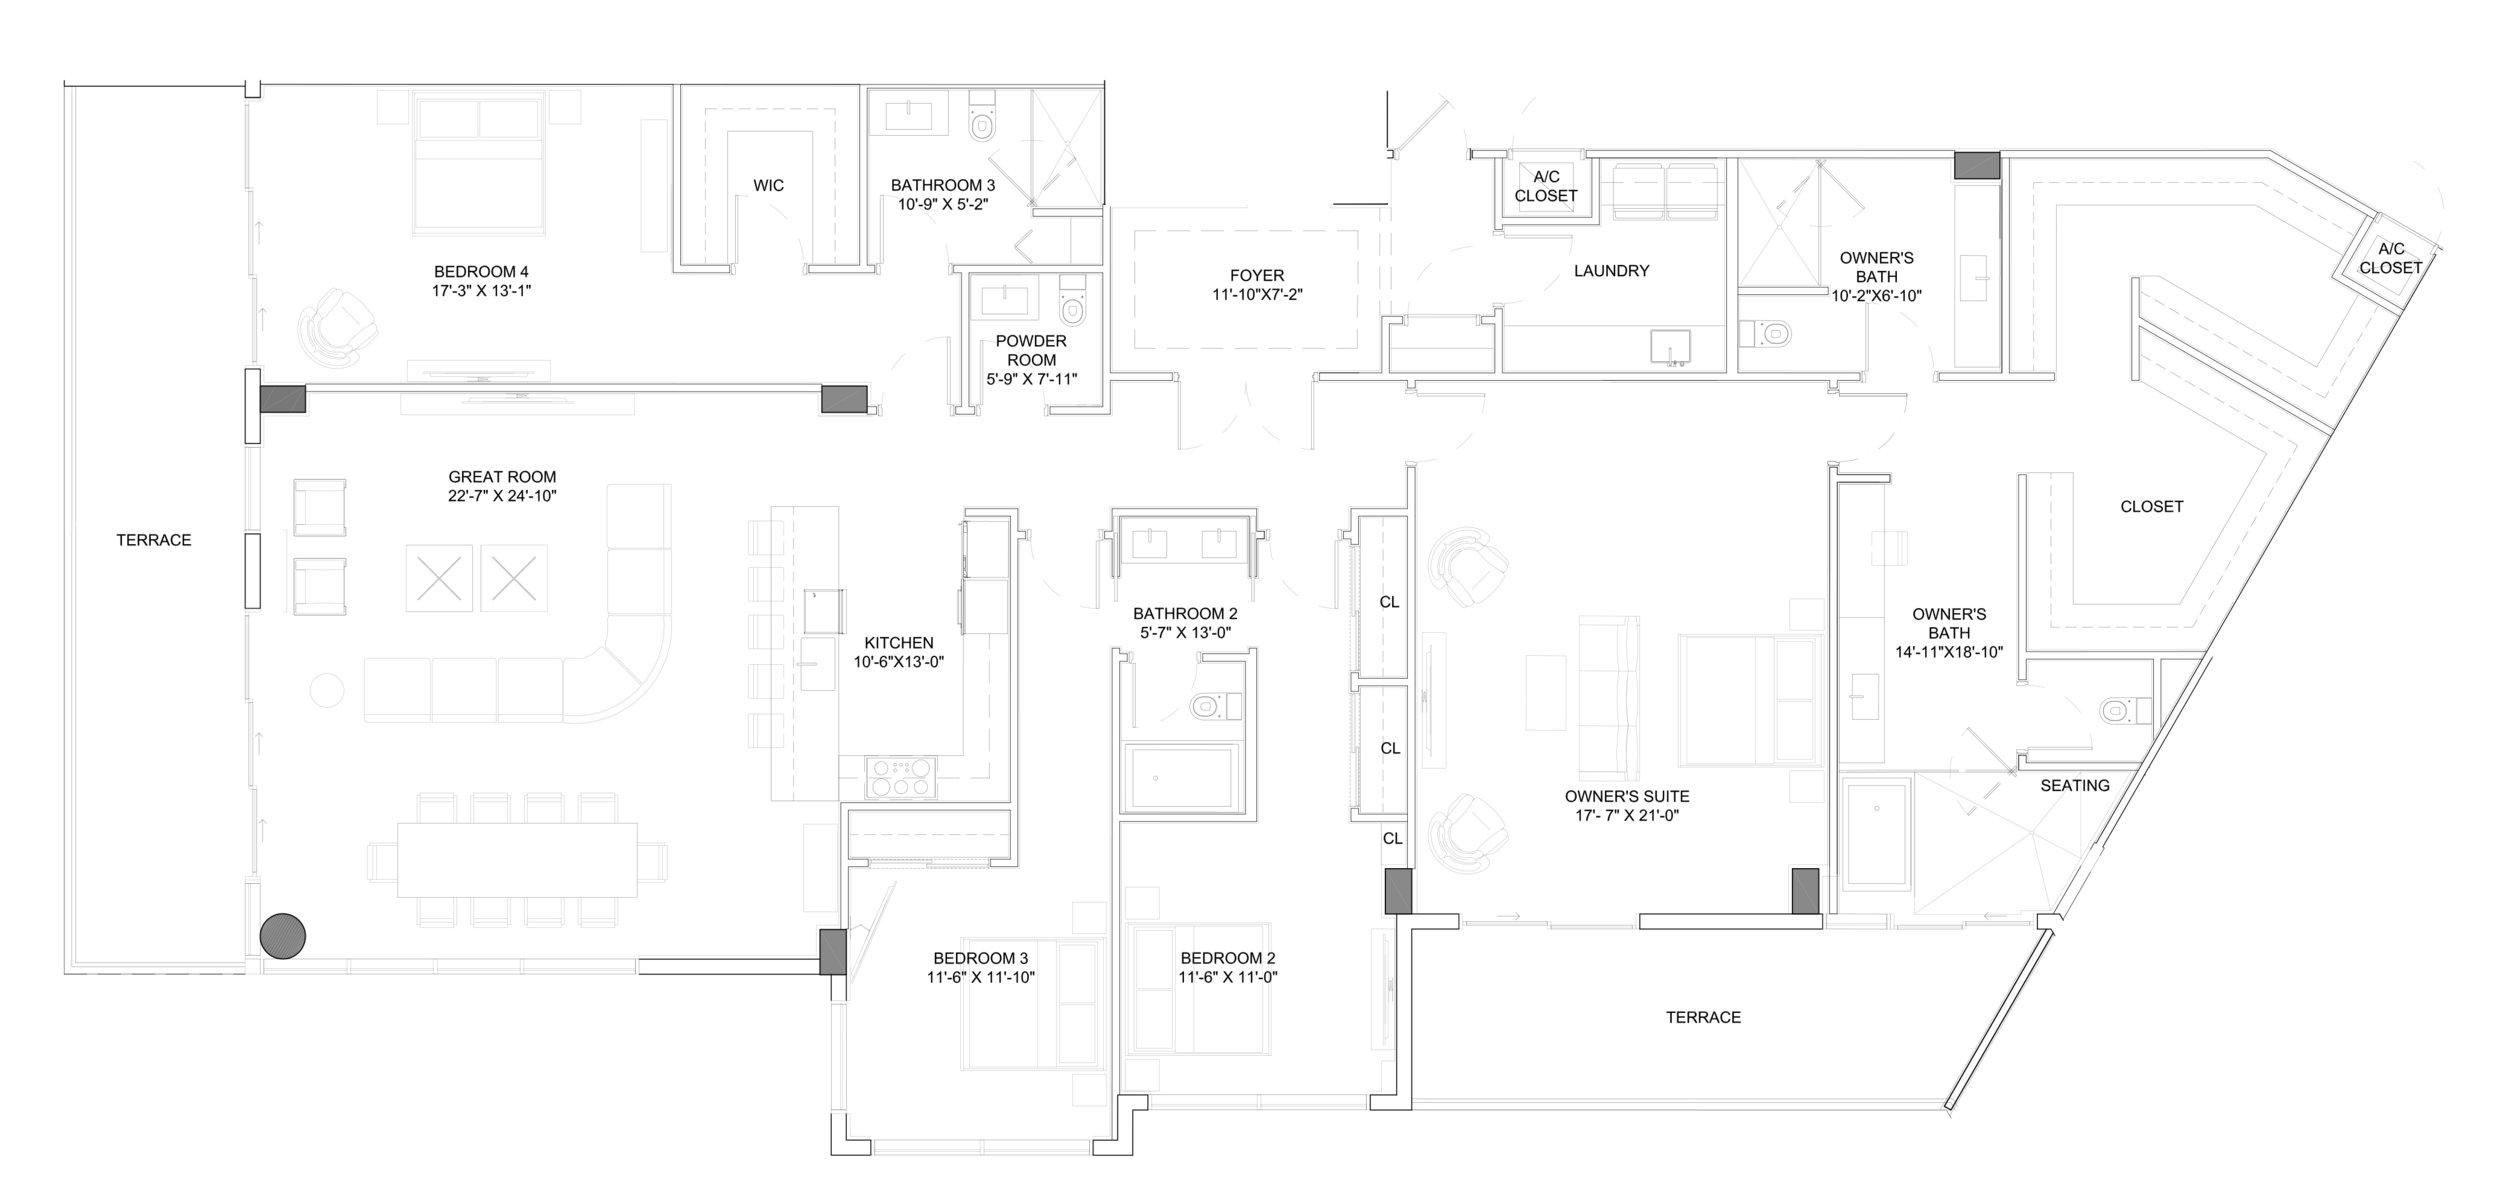 Penthouses B 4-4.5 3681 sf.jpg